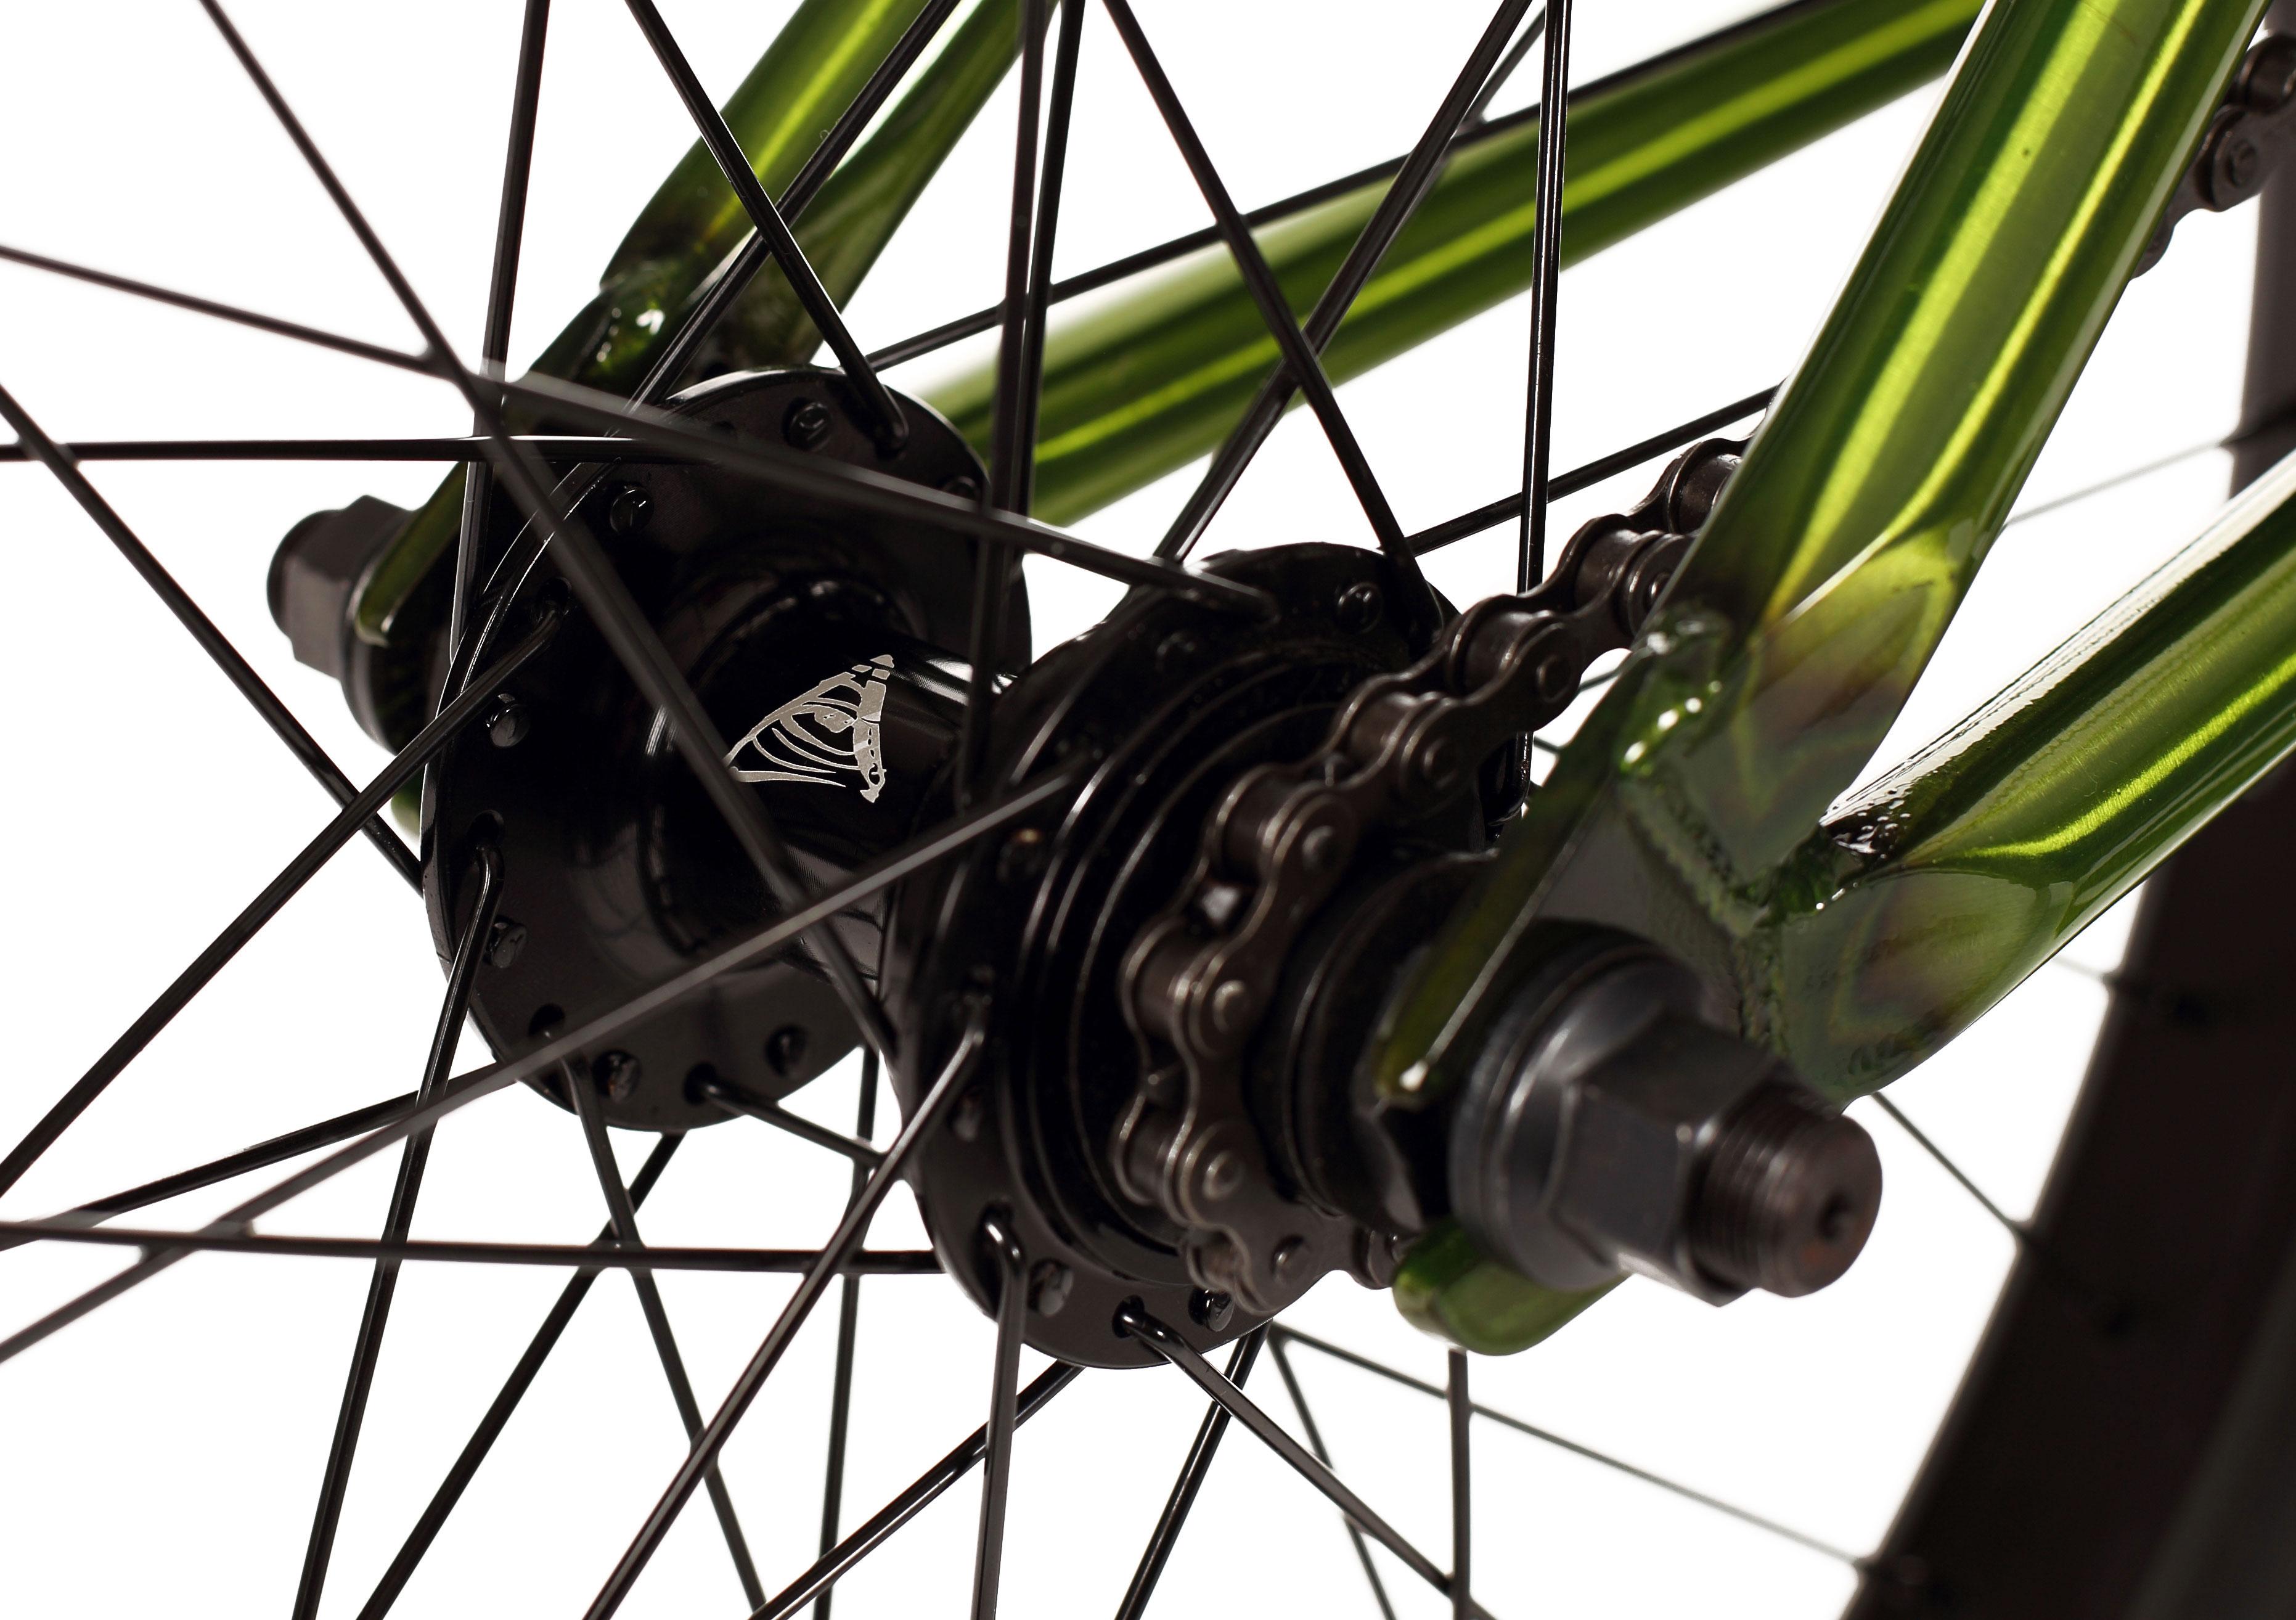 Stereo Bikes Speaker Plus 2019 Bmx Bike And Free Helmet Parts Diagram Swamp Gloss Trans Slimy